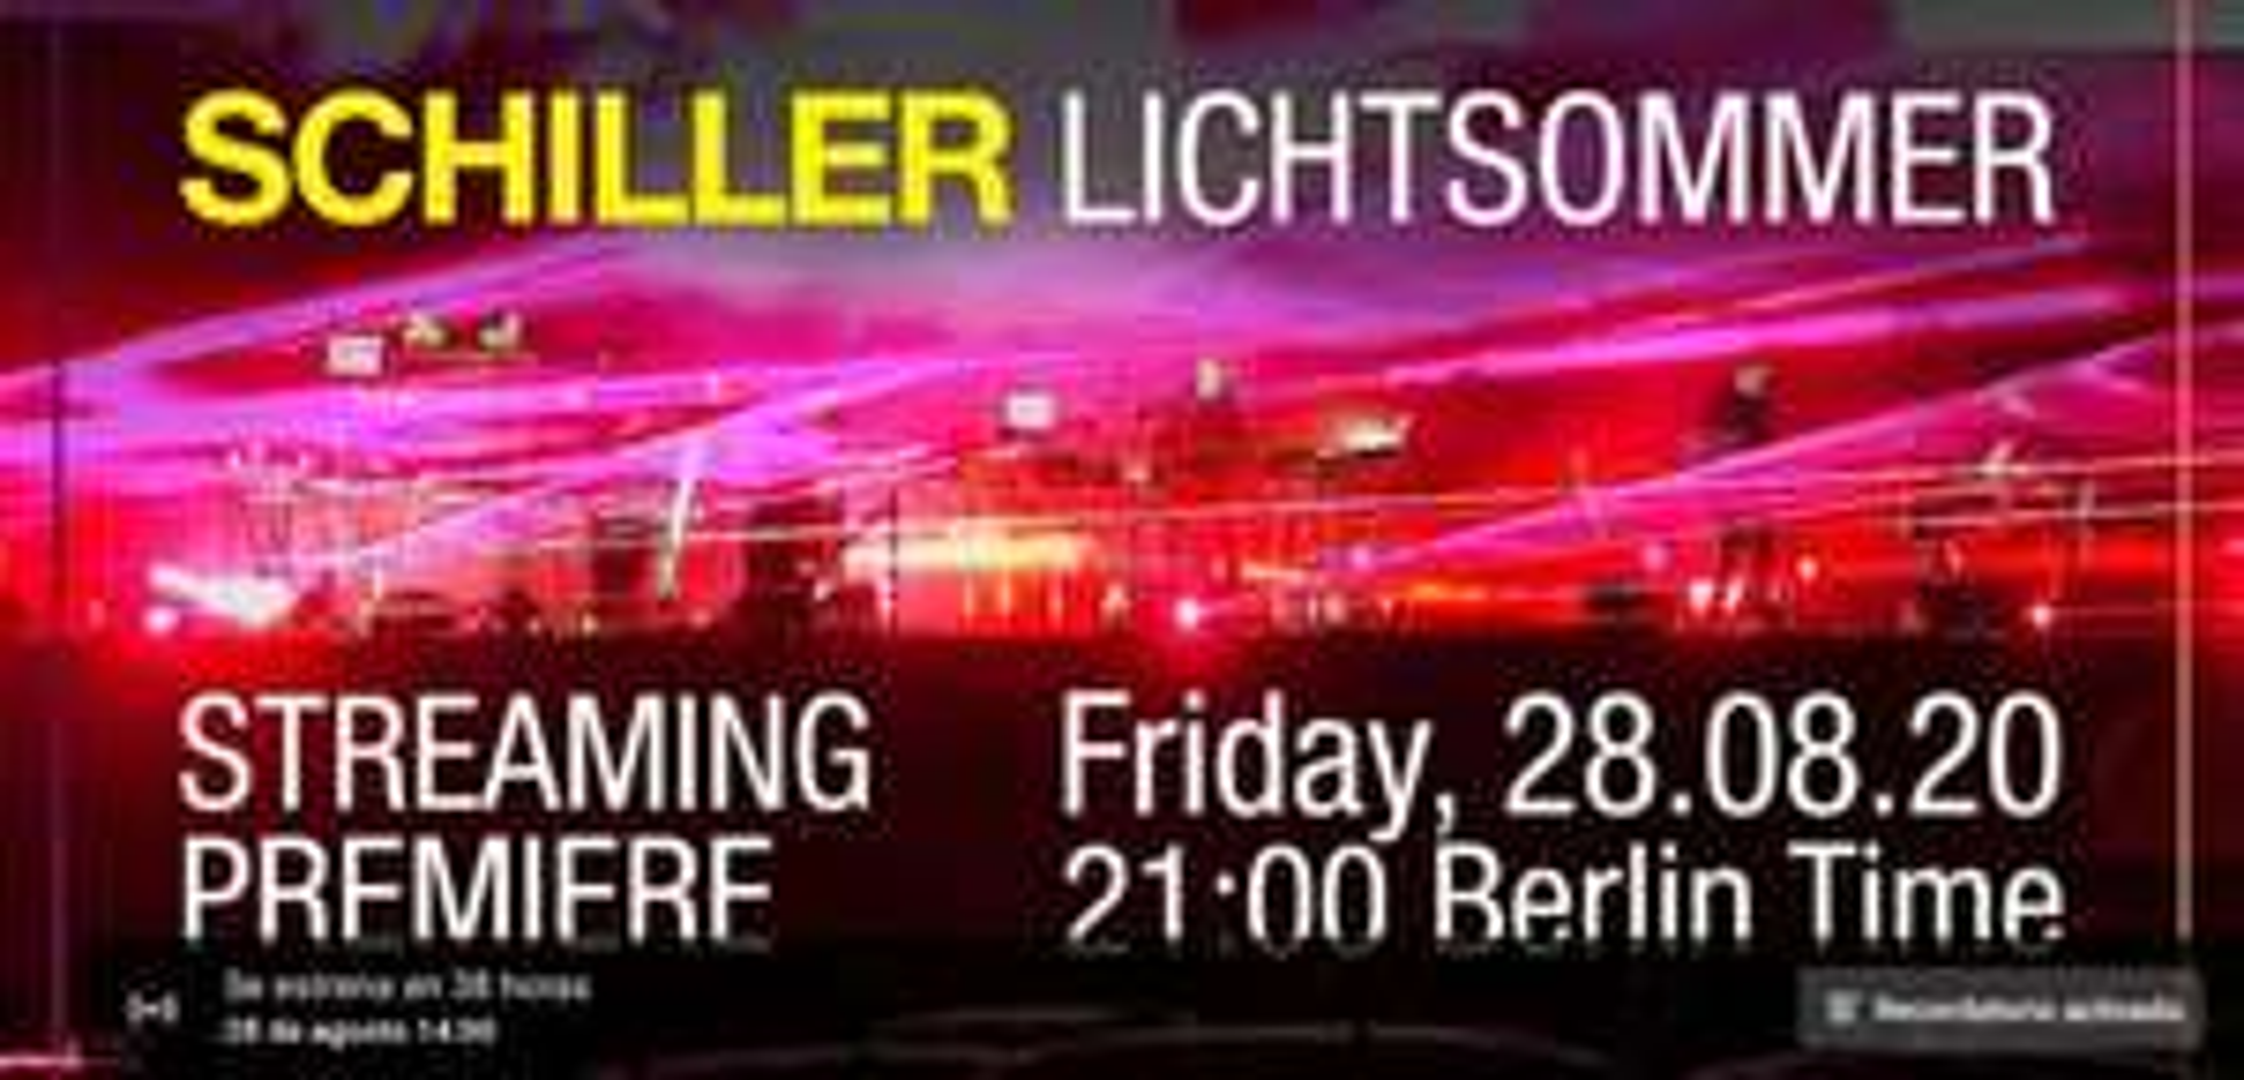 Streaming del Concierto de Schiller 'Lichtsommer'